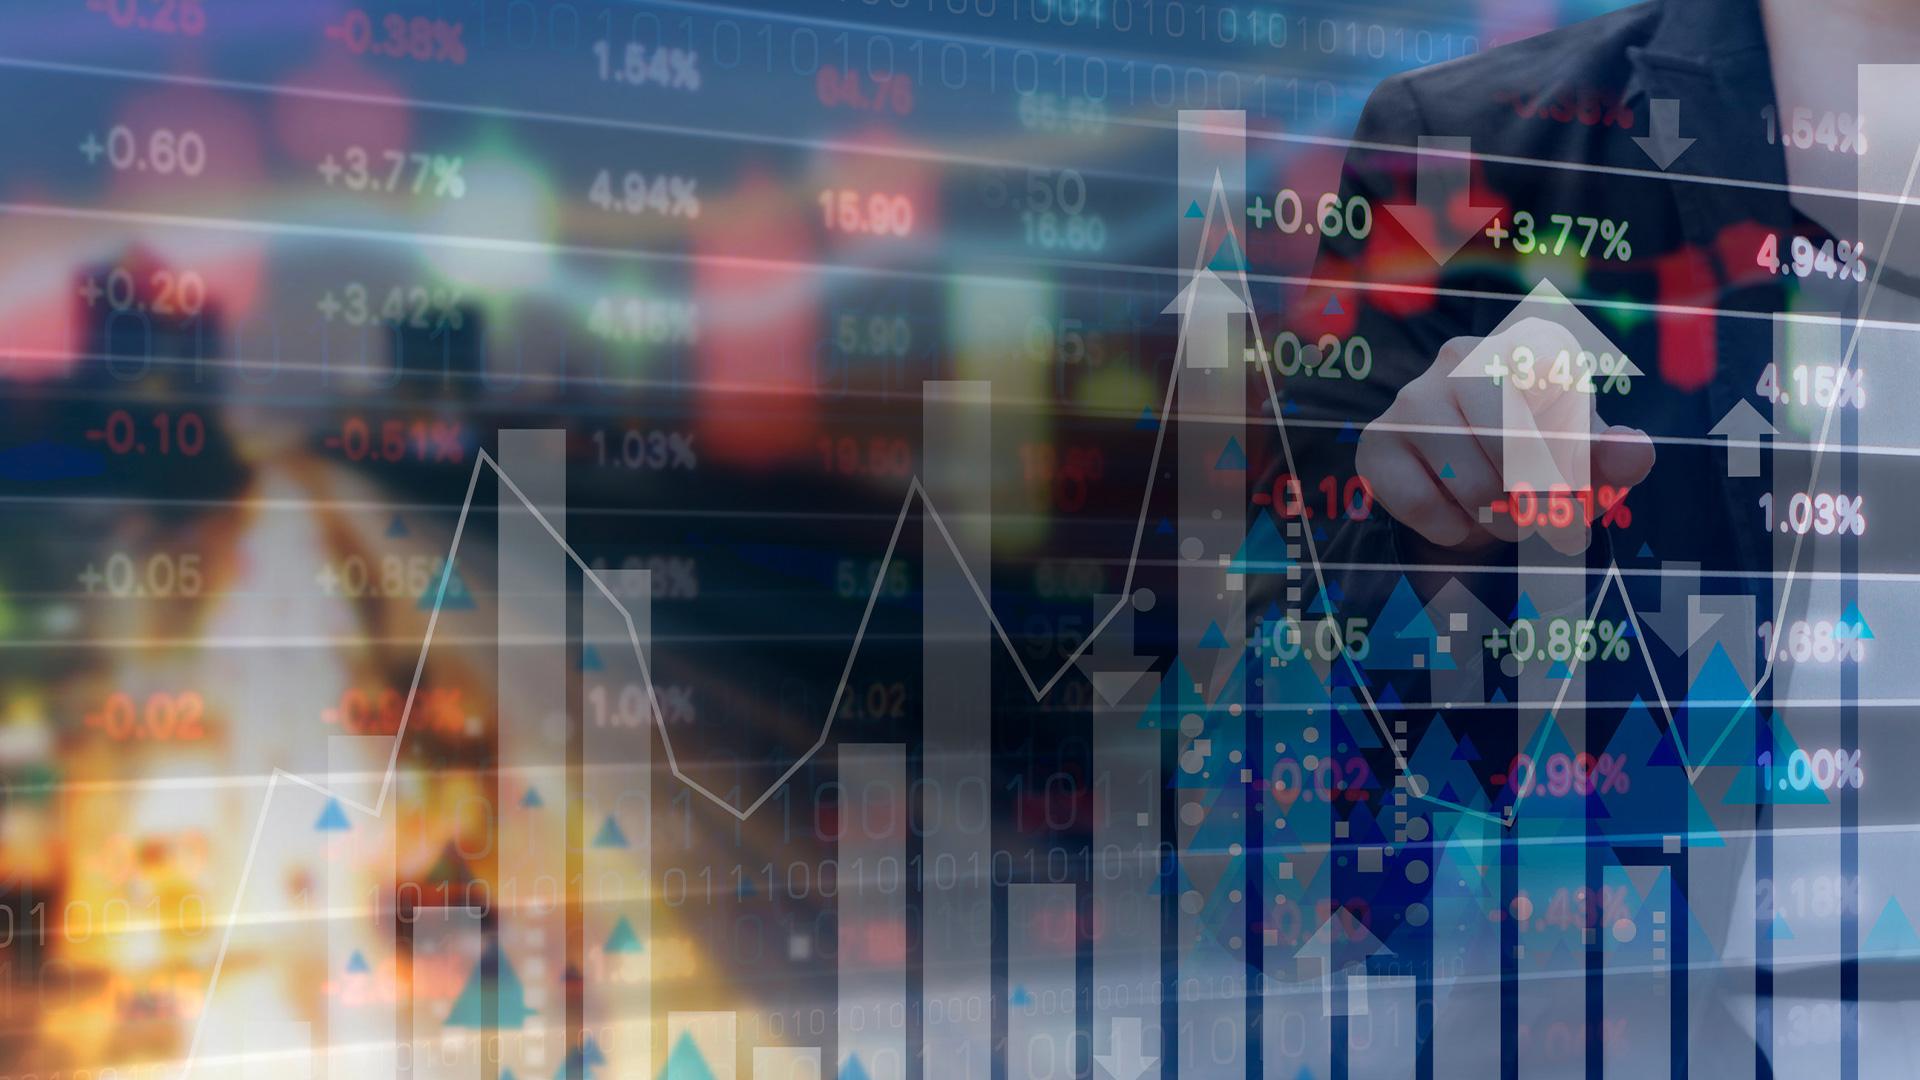 Wall Street trading charts Illustration